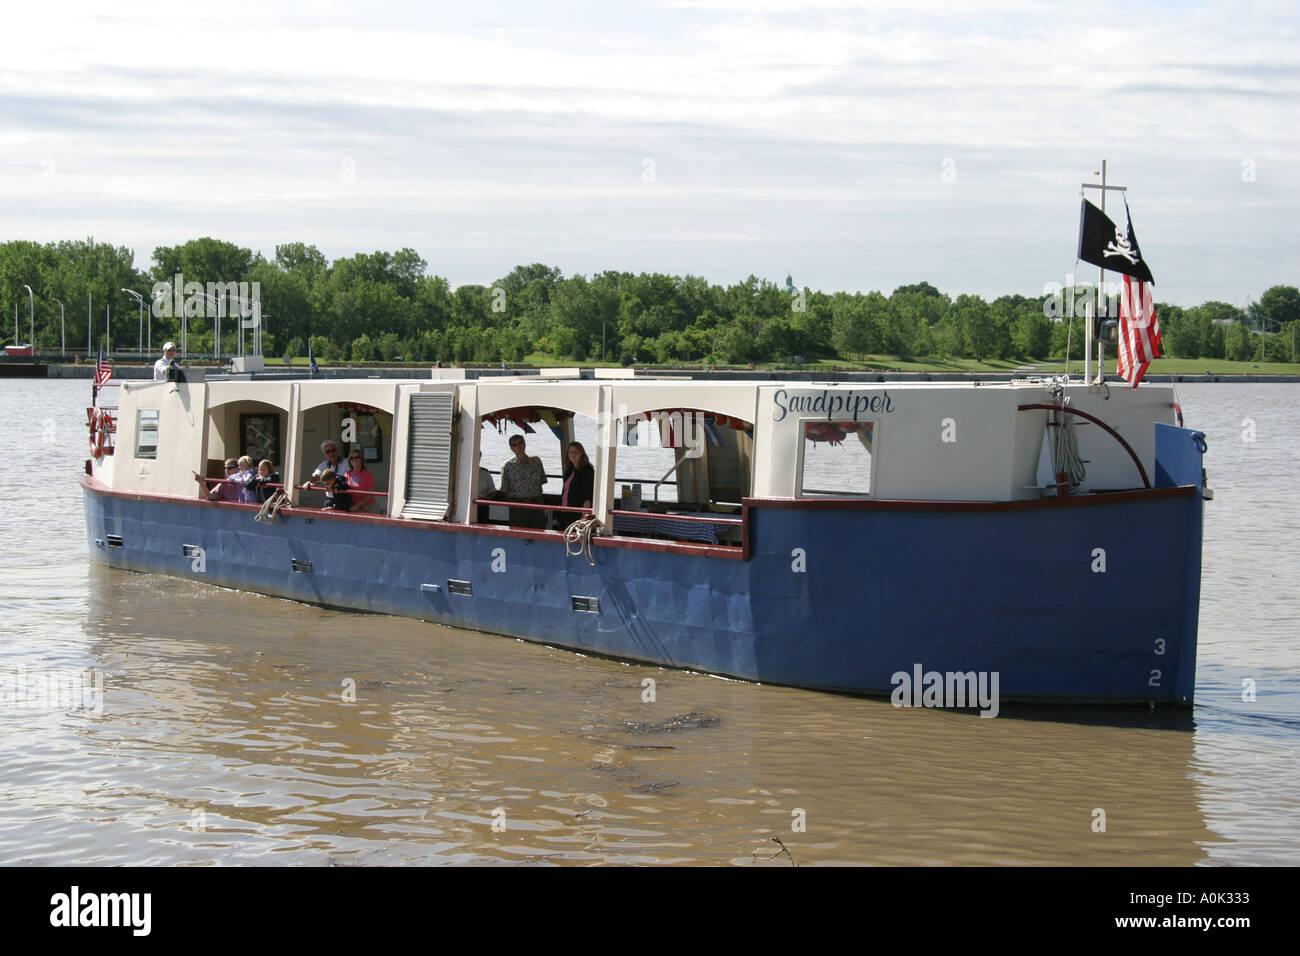 Ohio lucas county maumee - Stock Photo Toledo Ohio Maumee River Sandpiper Boat Tour Boat